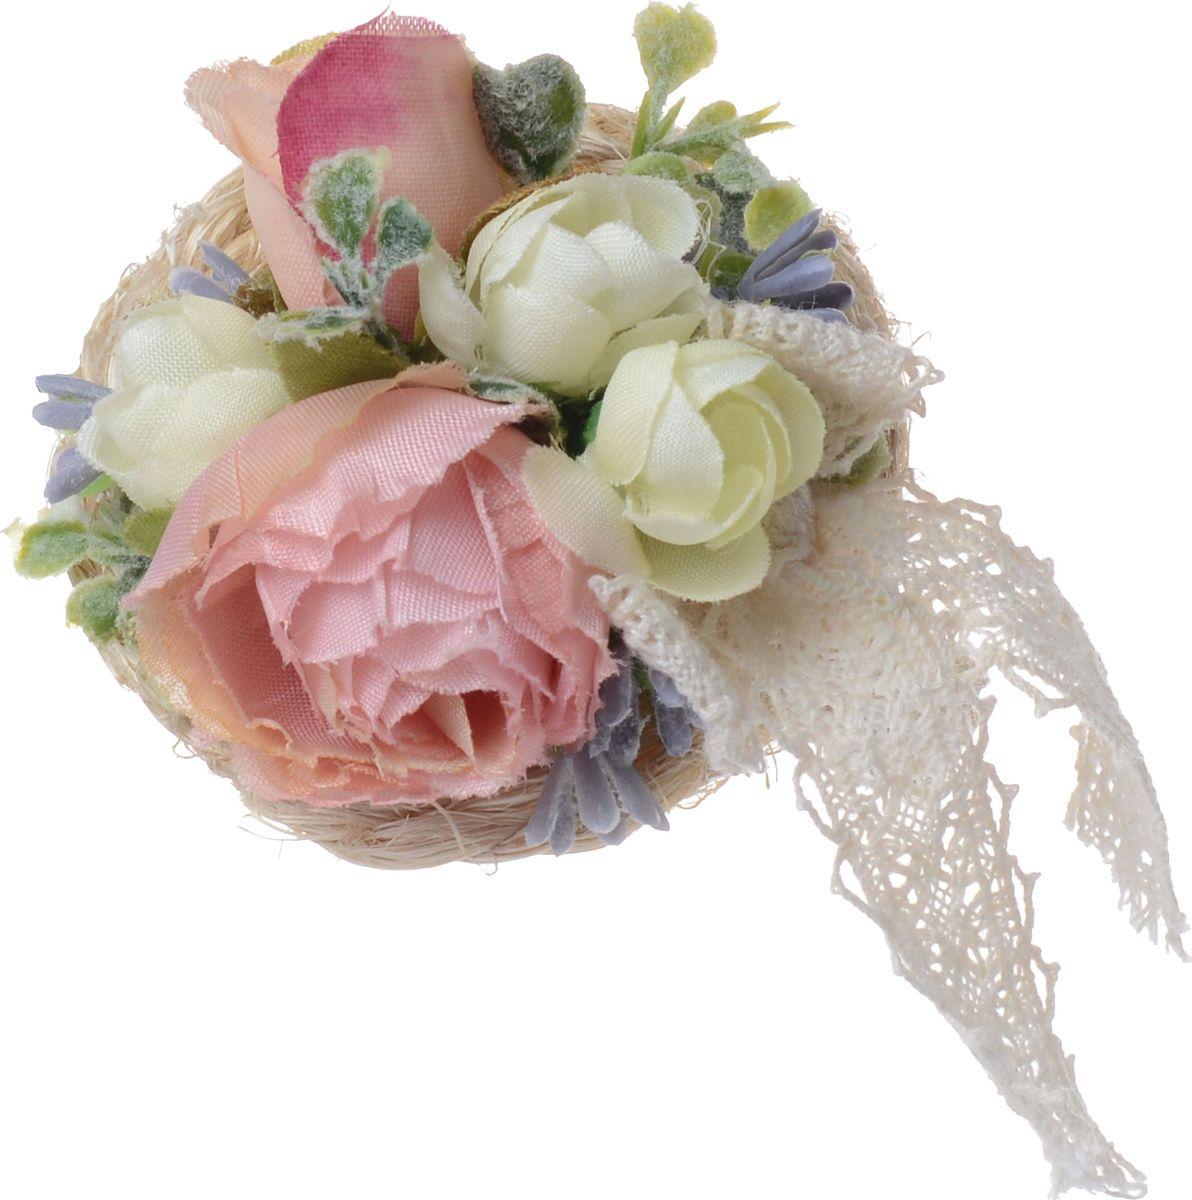 Заколка для волос Malina By Андерсен Шампань, цвет: розовый. 11701тб0211701тб02